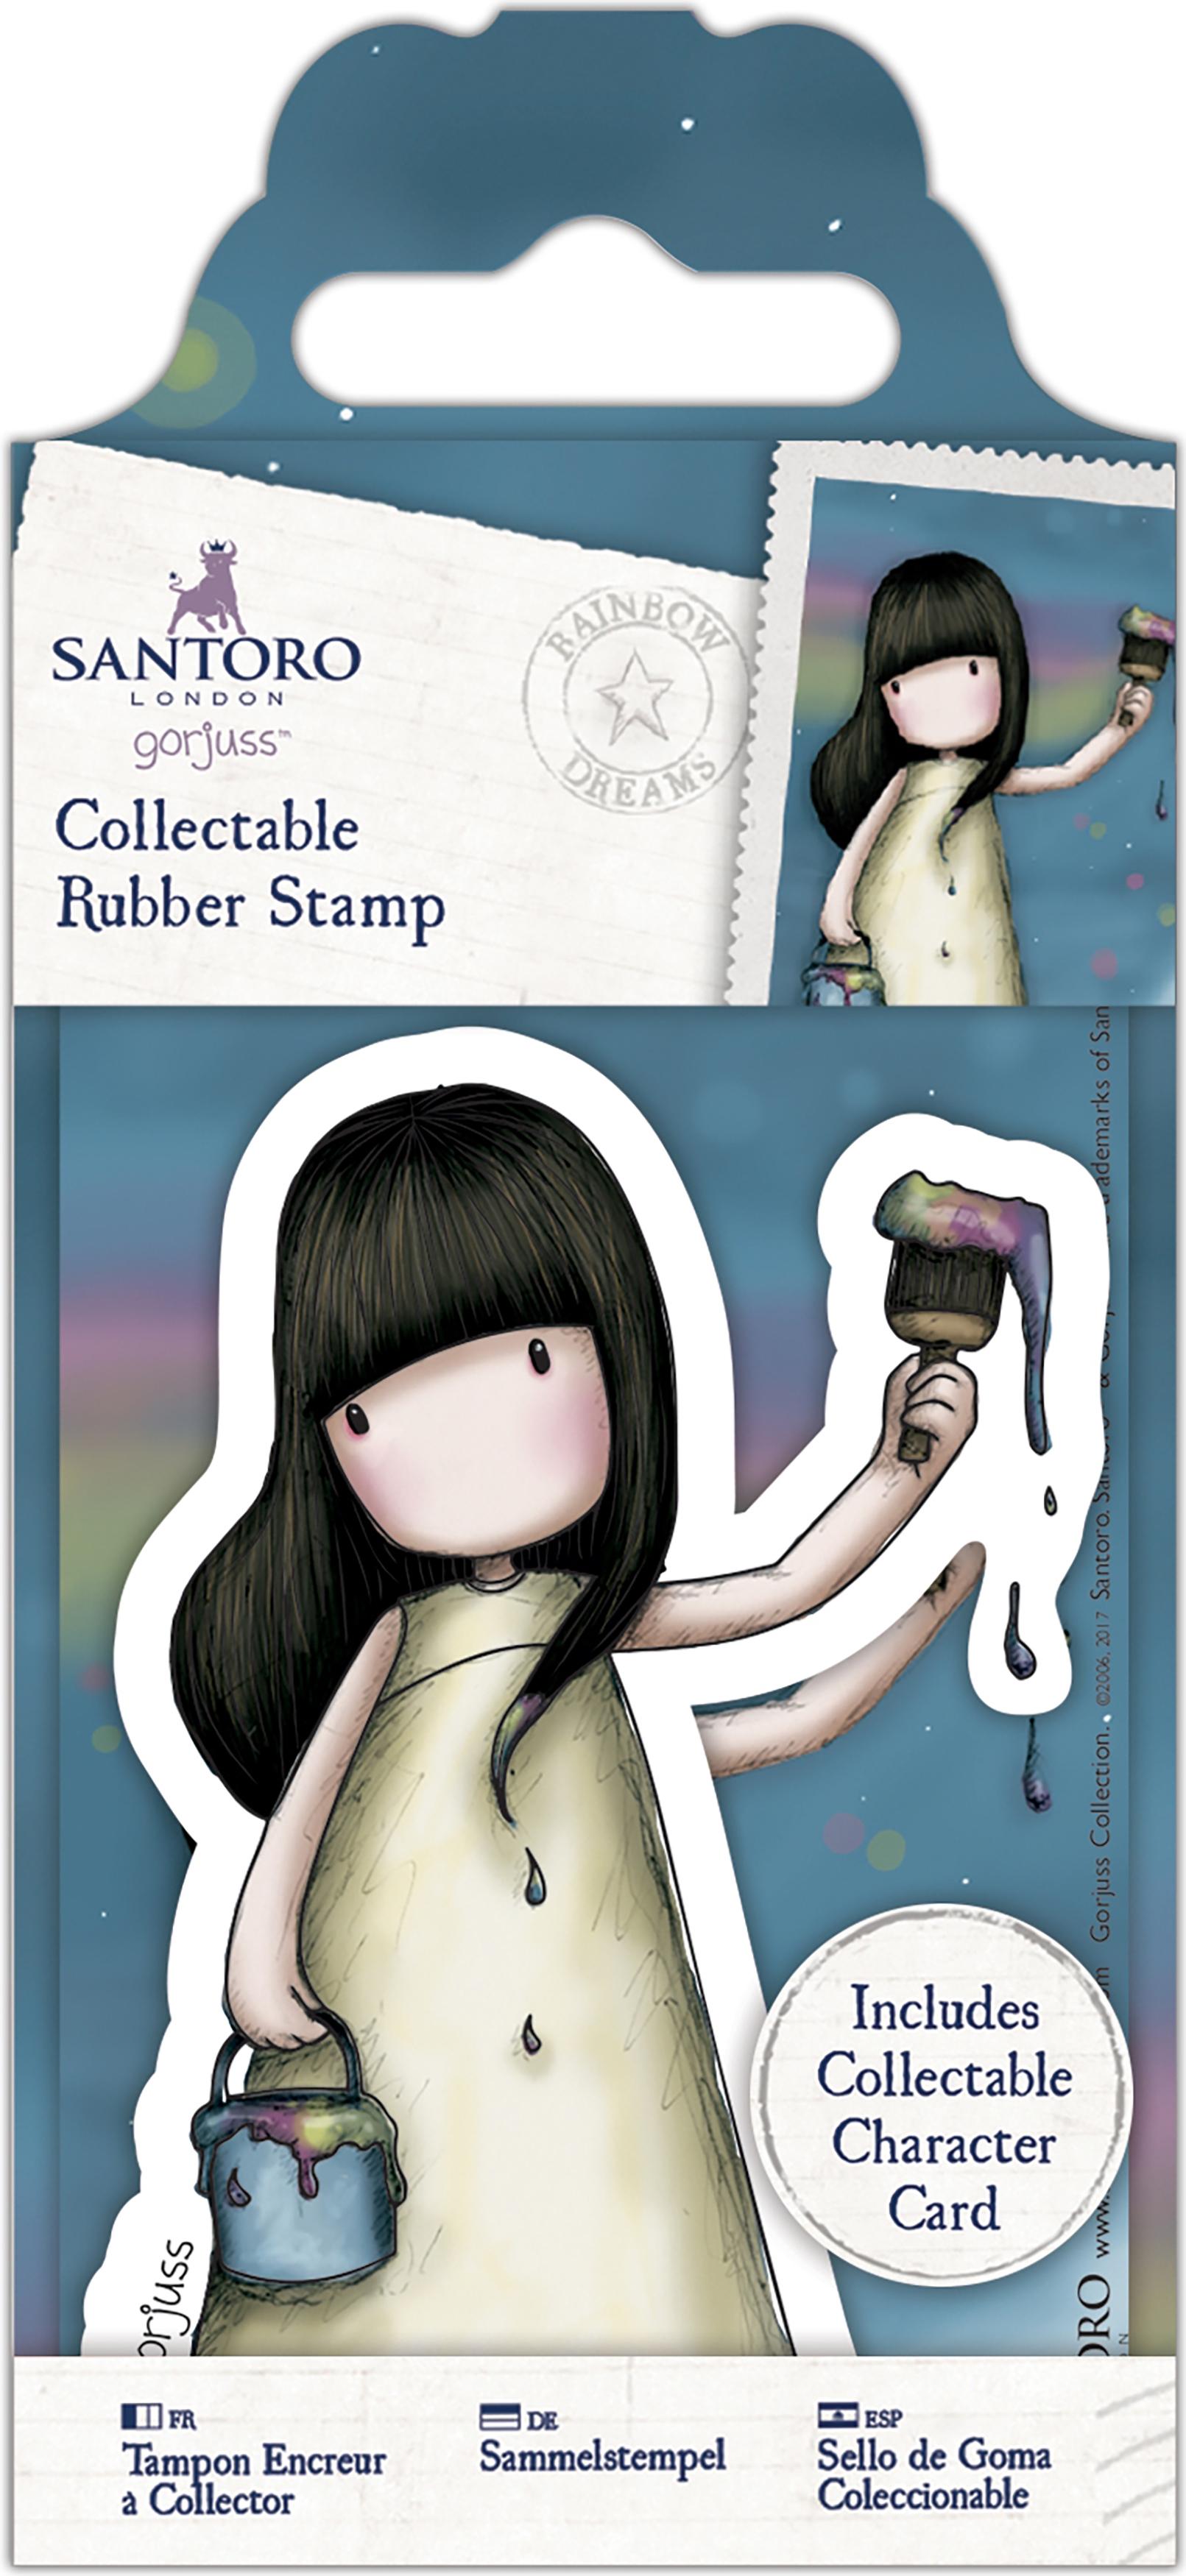 Santoro's Gorjuss Rubber Stamp-No. 46 Rainbow Dreams